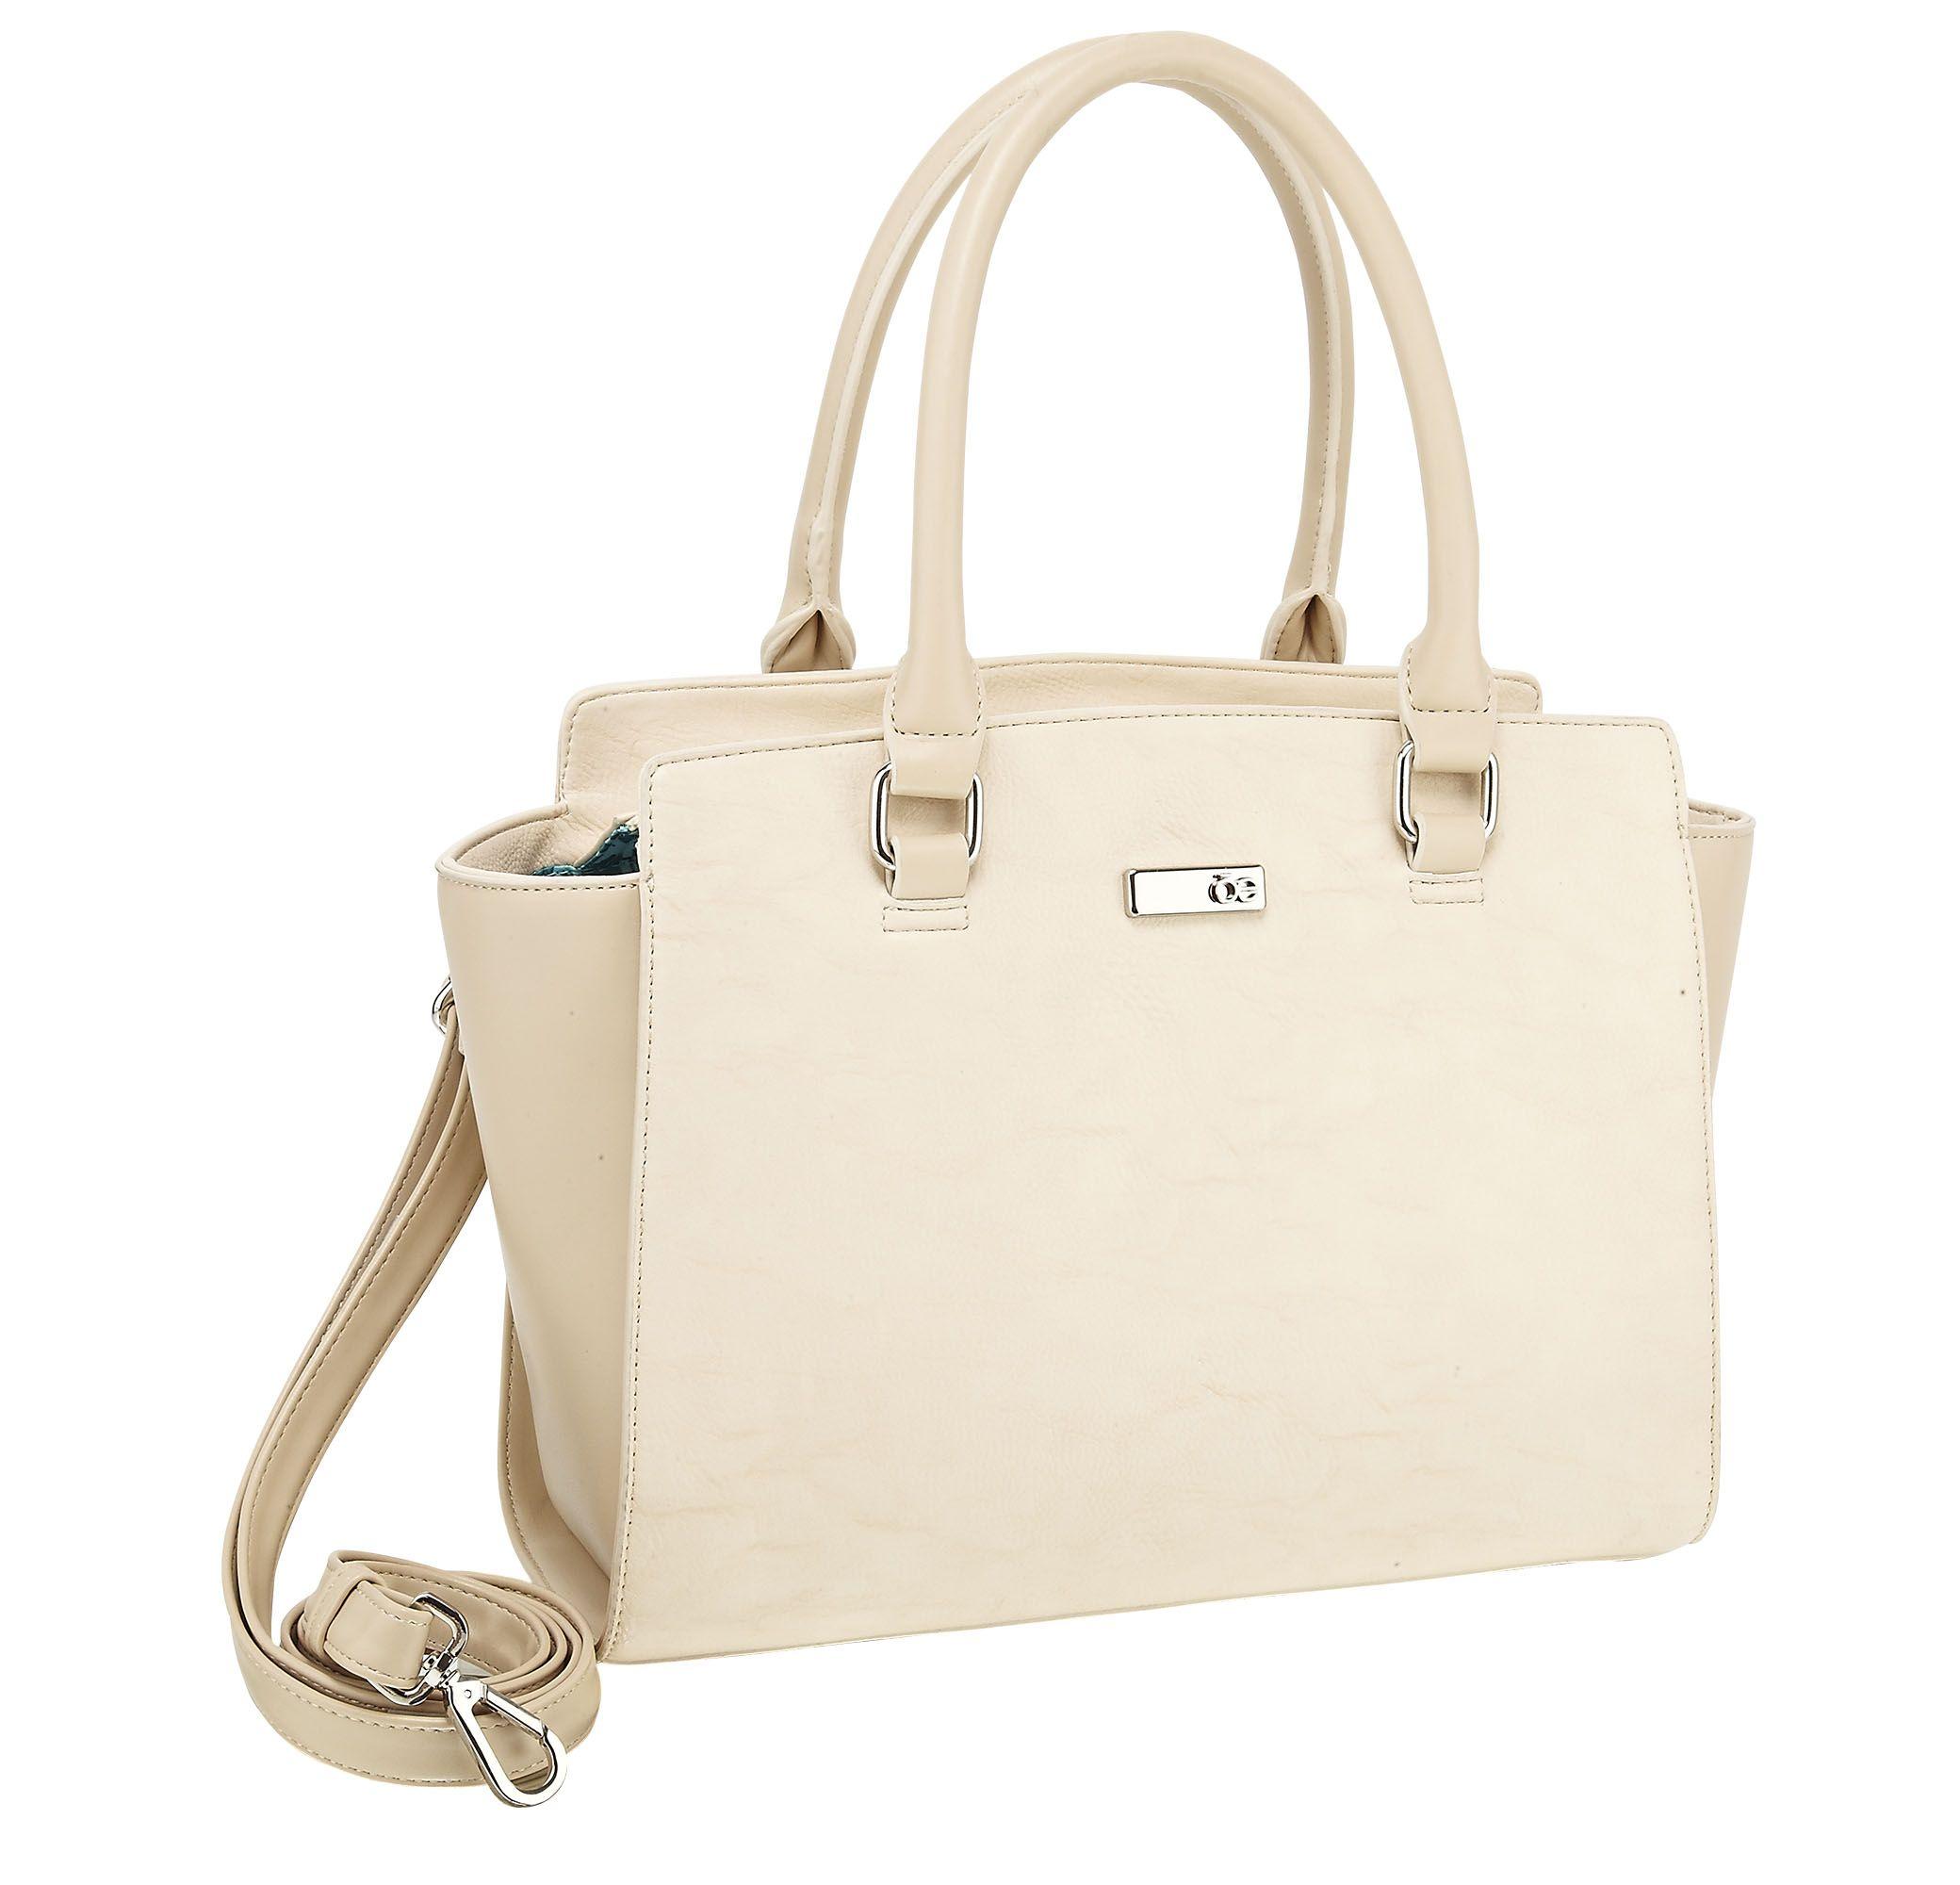 Handbags Bolso Cloe Otoño Invierno 2017 Beth 074 Oe Moda